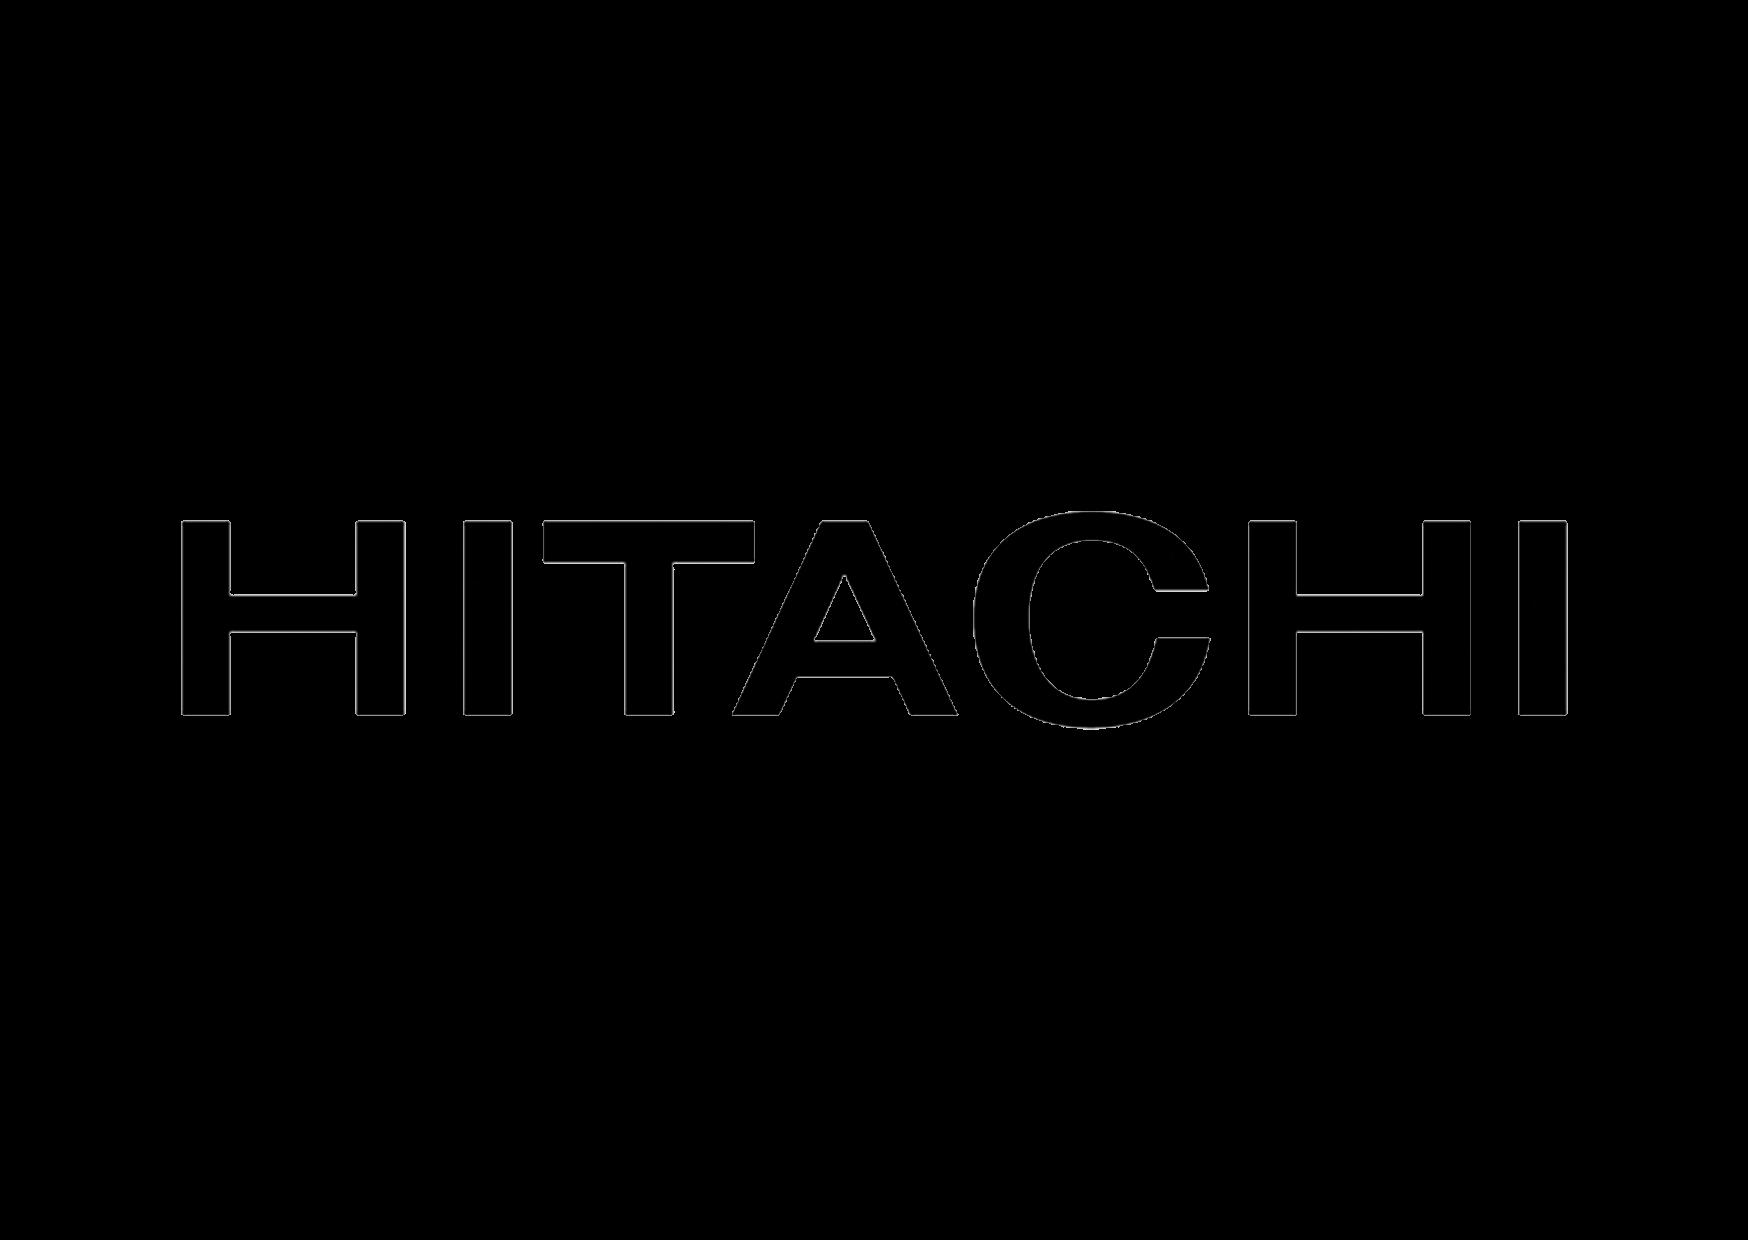 Hitatchi